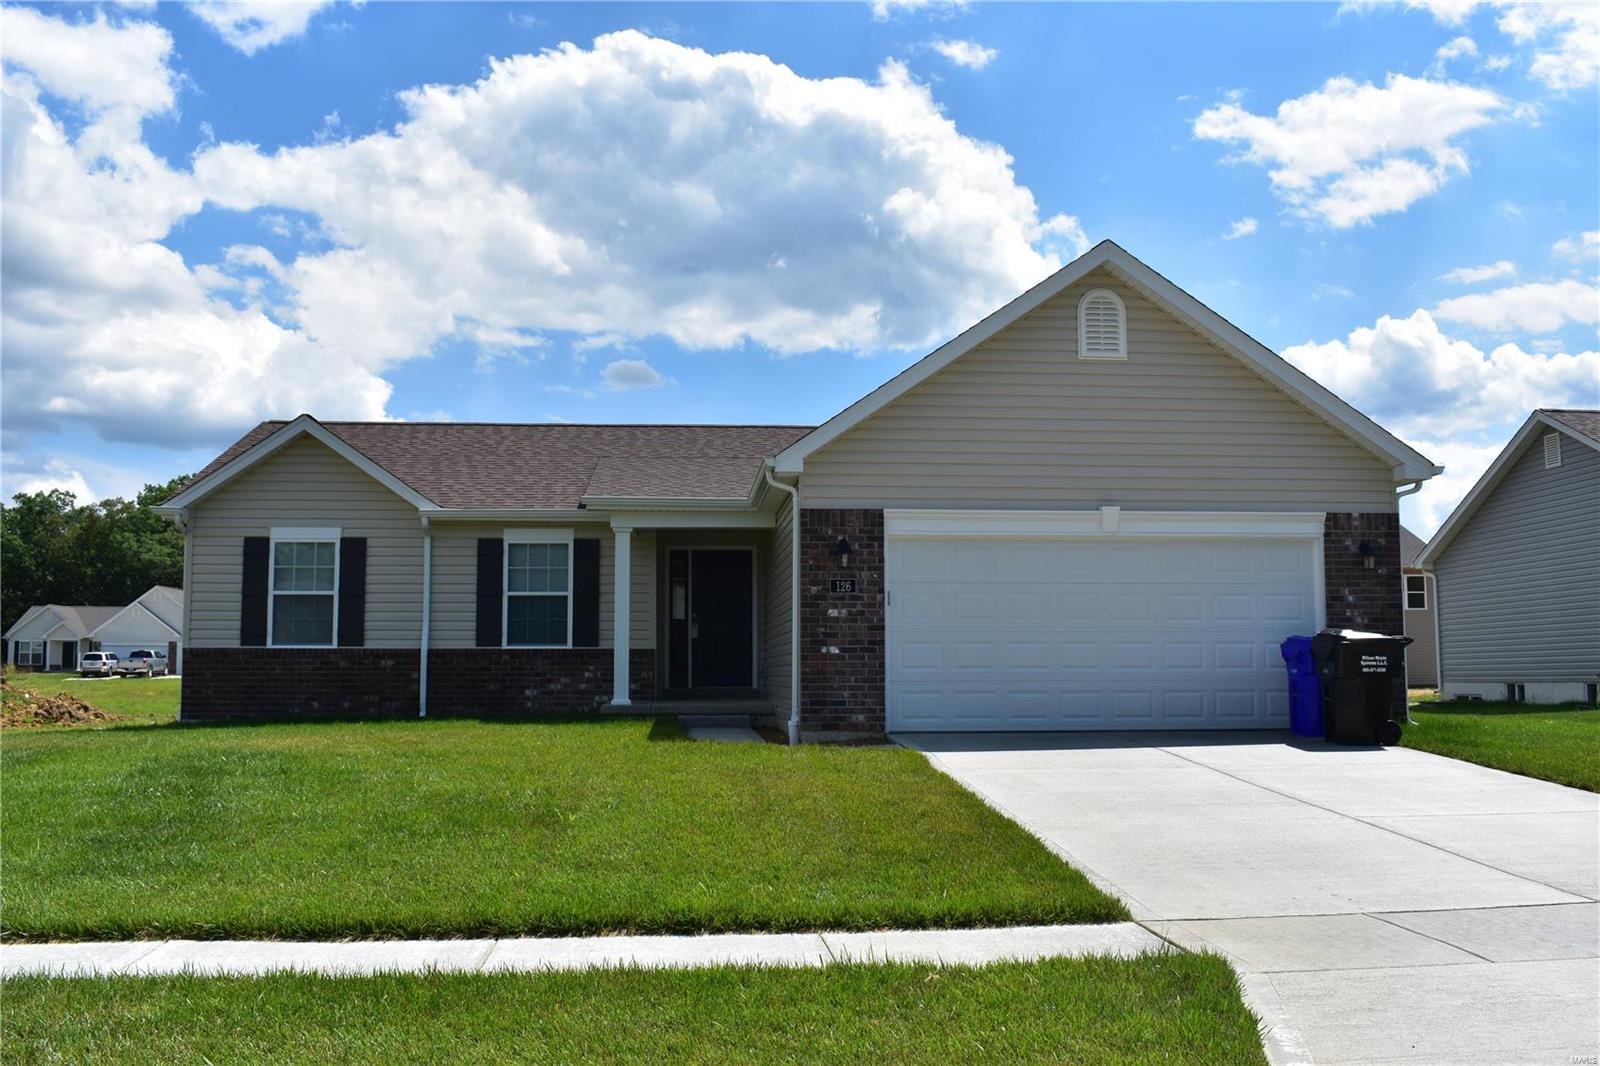 125 TBB-Lot 13 Bryan Ridge Property Photo - Wright City, MO real estate listing